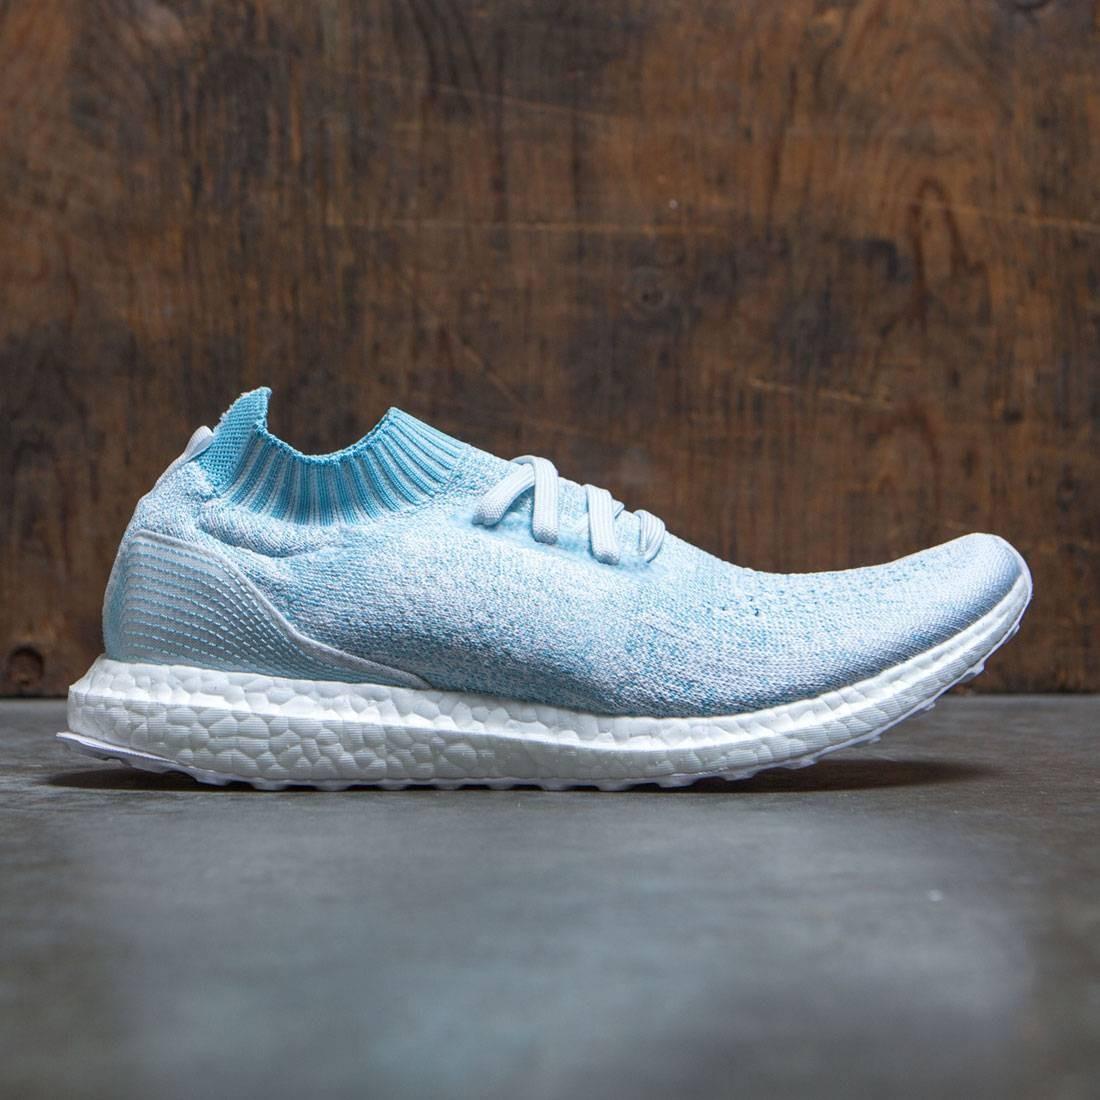 best website e05eb 0411b Adidas Men UltraBOOST Uncaged Parley blue icey blue footwear white